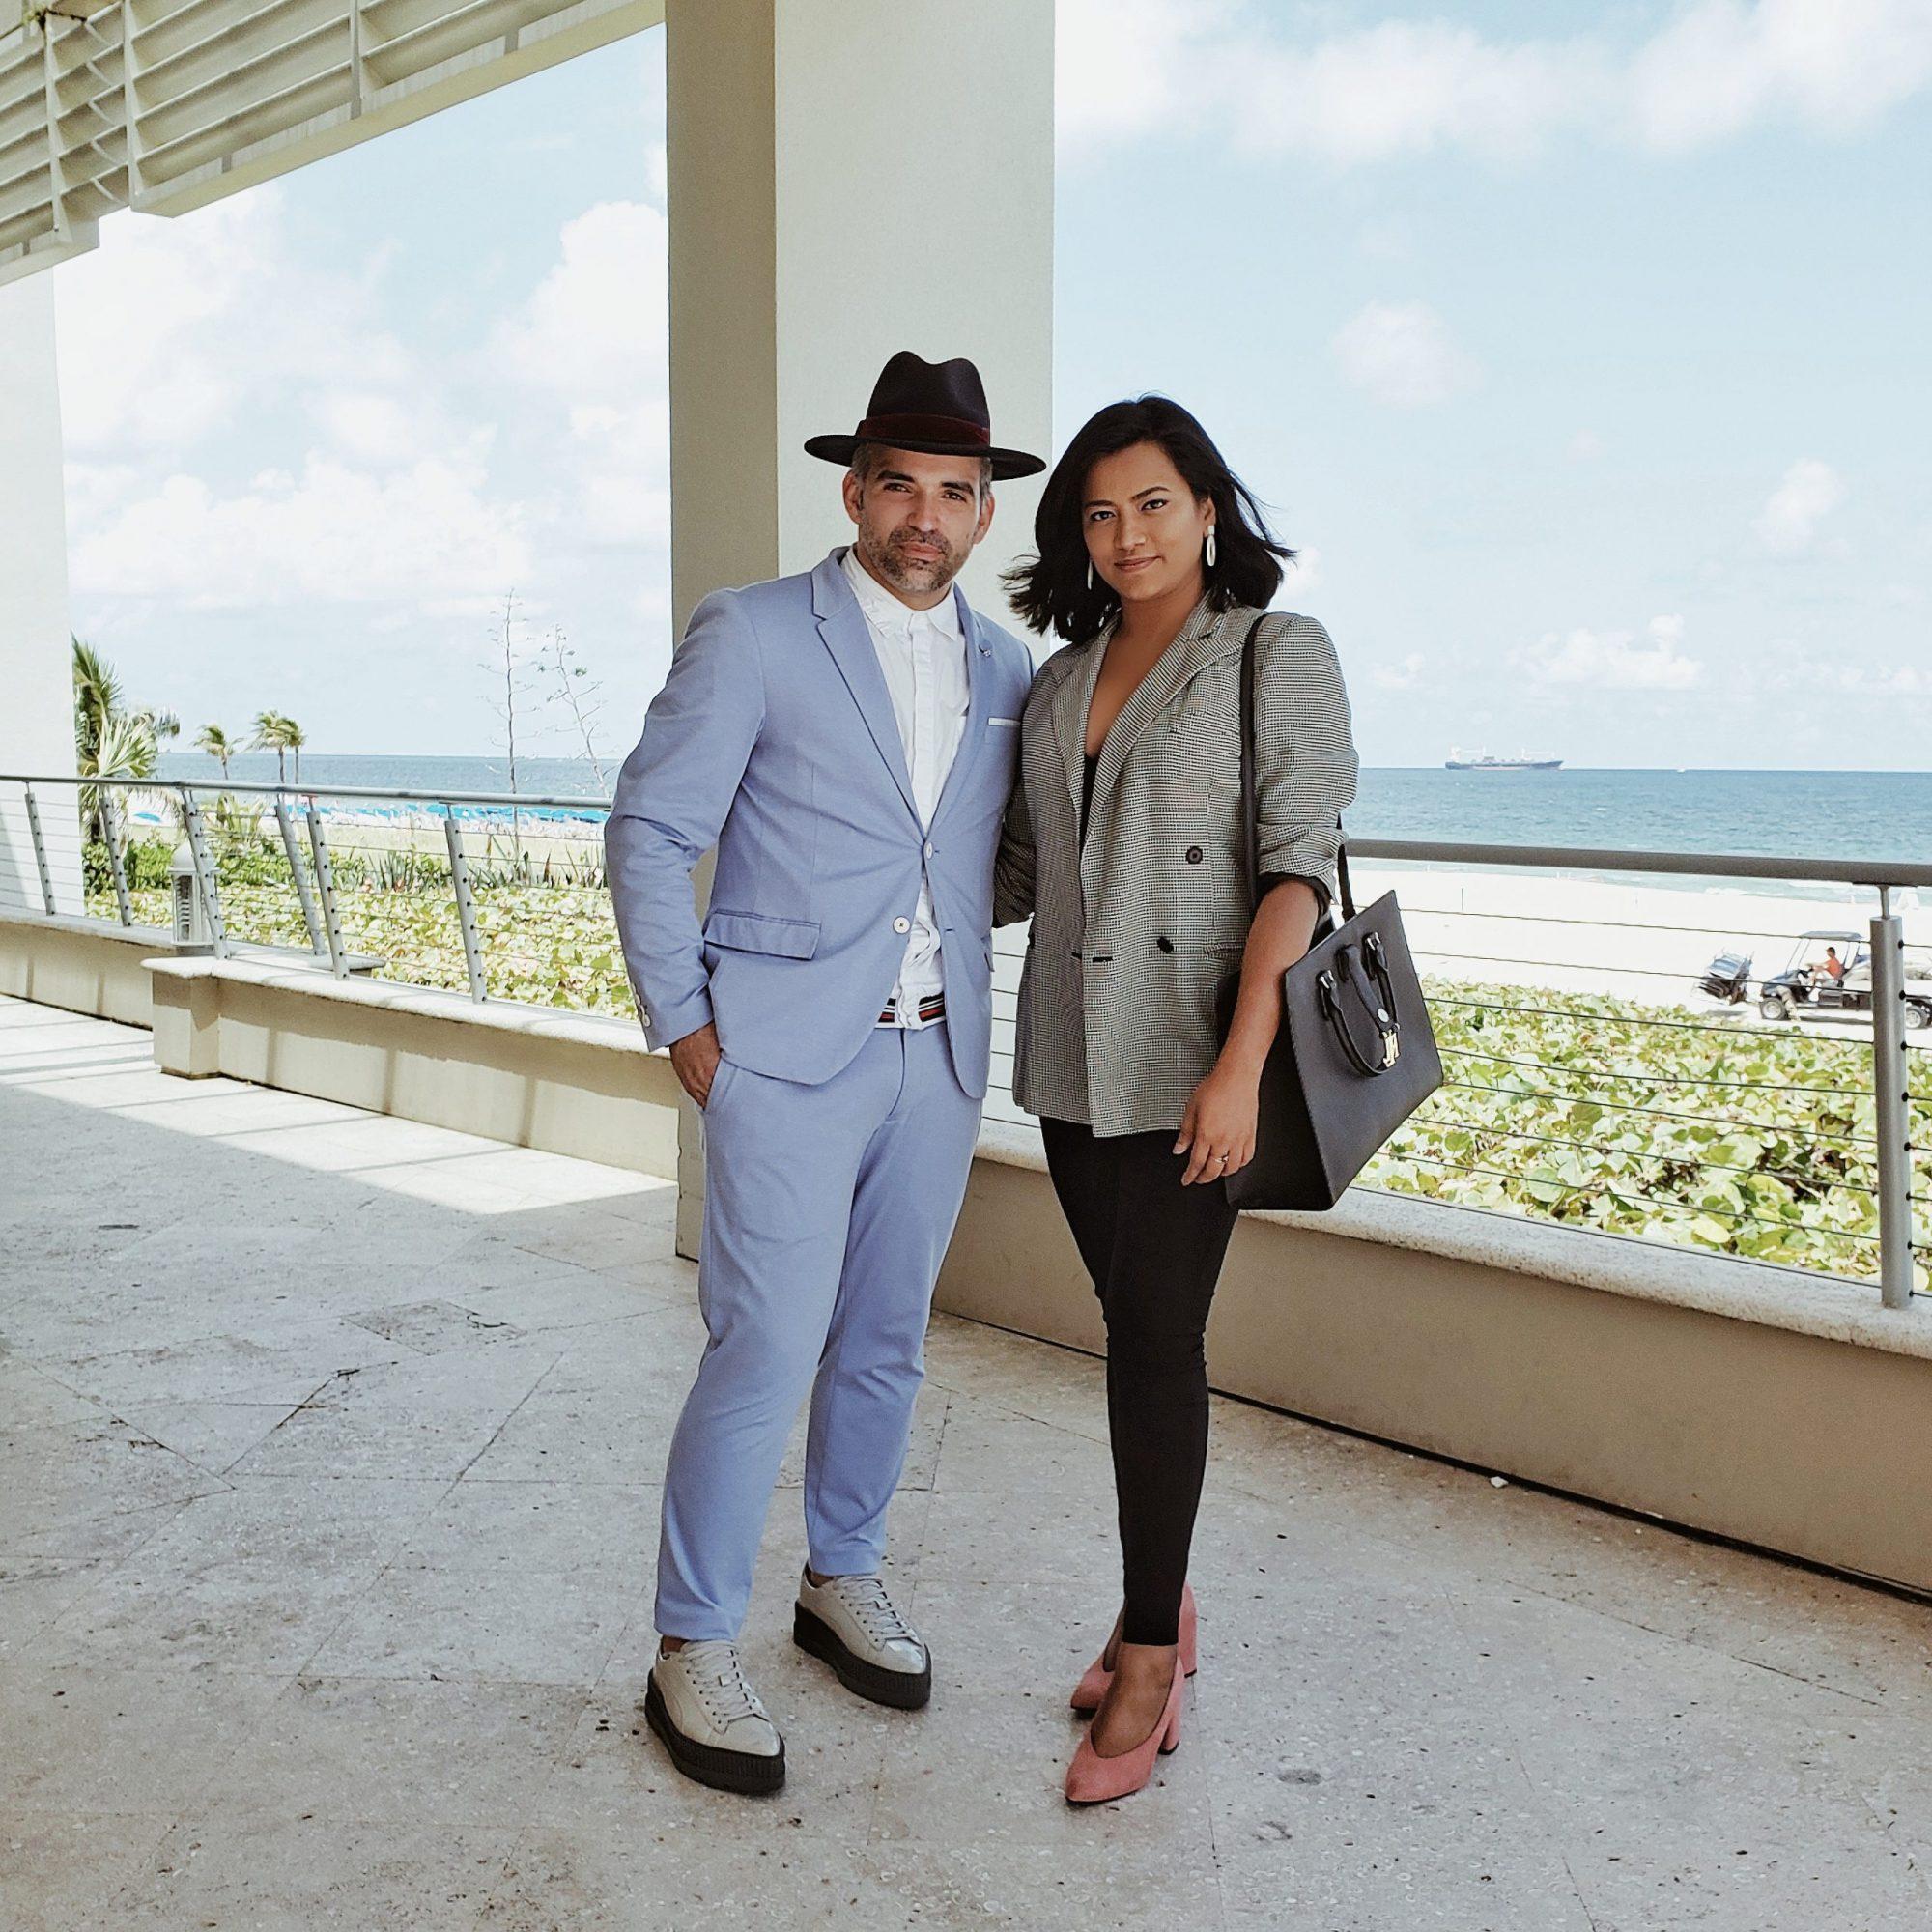 Cintas Fashion Designer Gustavo Alonzo & Miami Fashion Blogger Afroza Khan